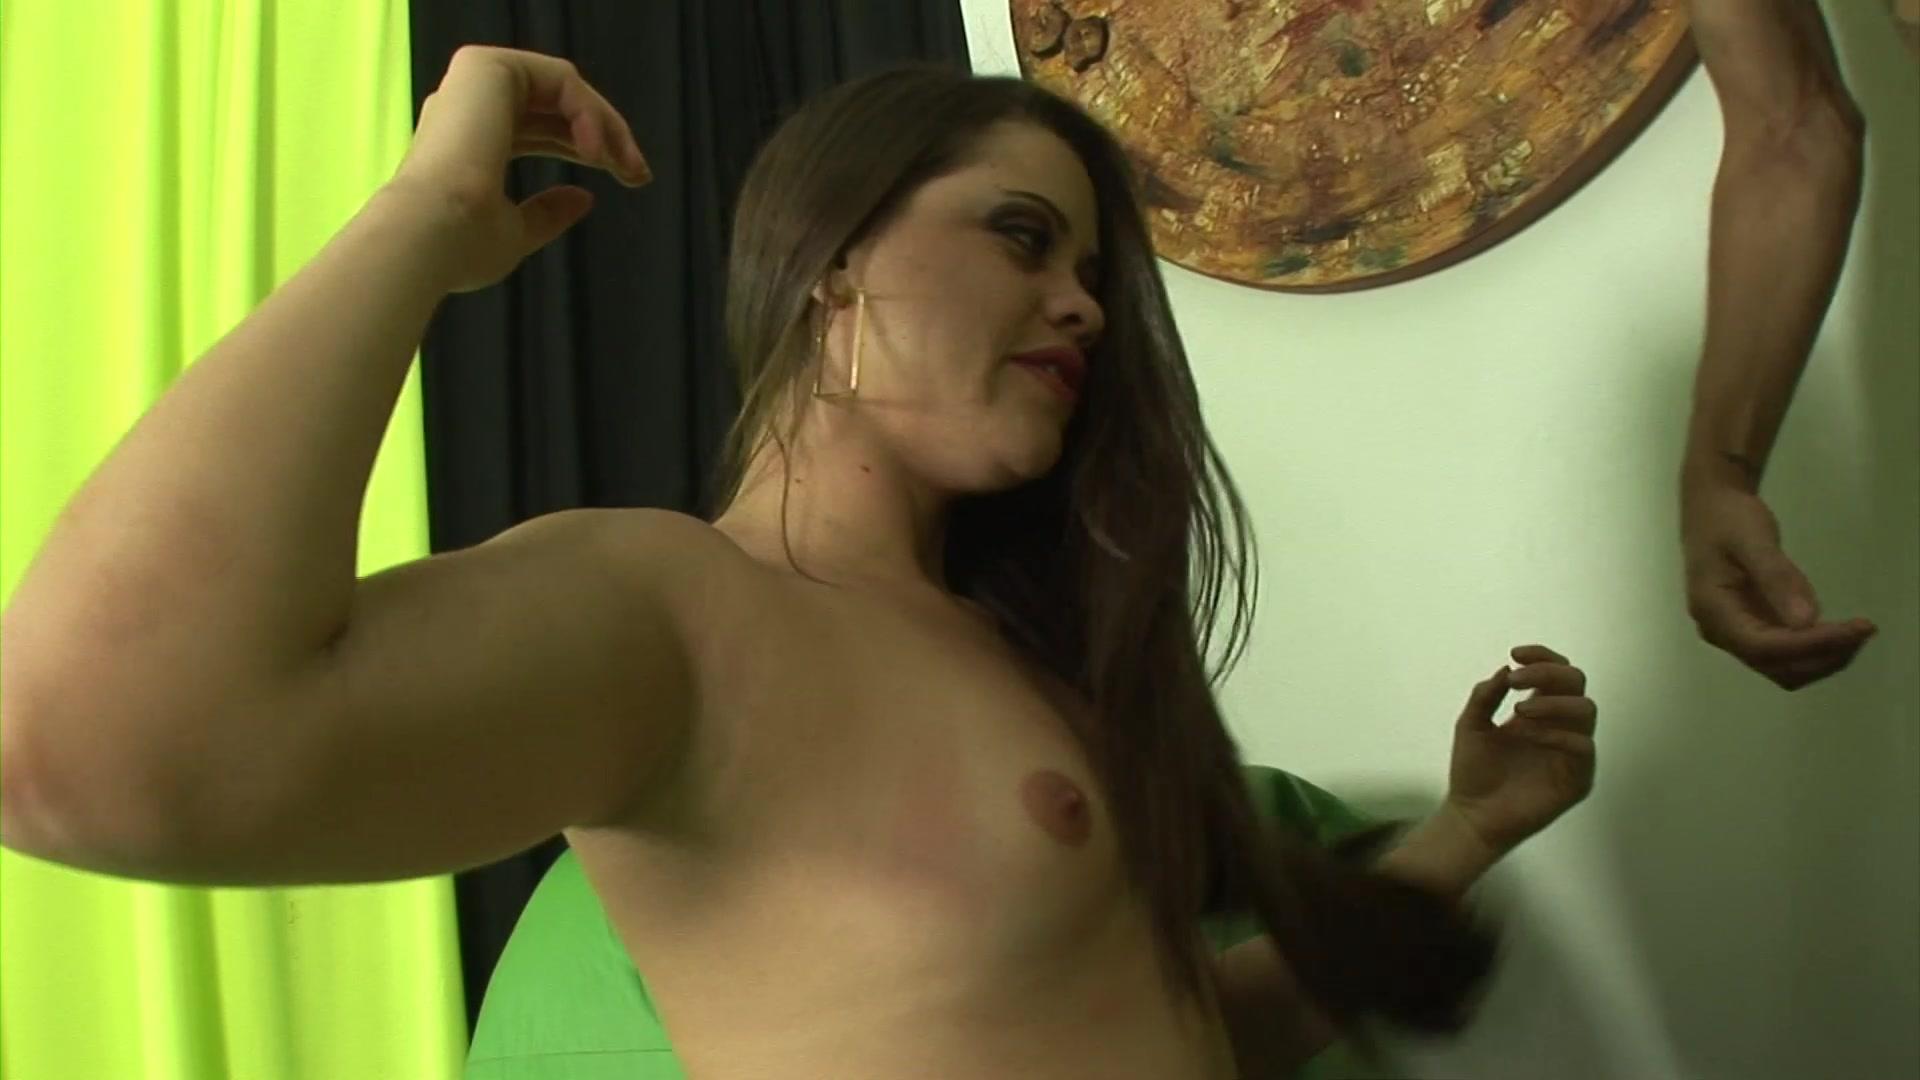 Adult massage nude tantra